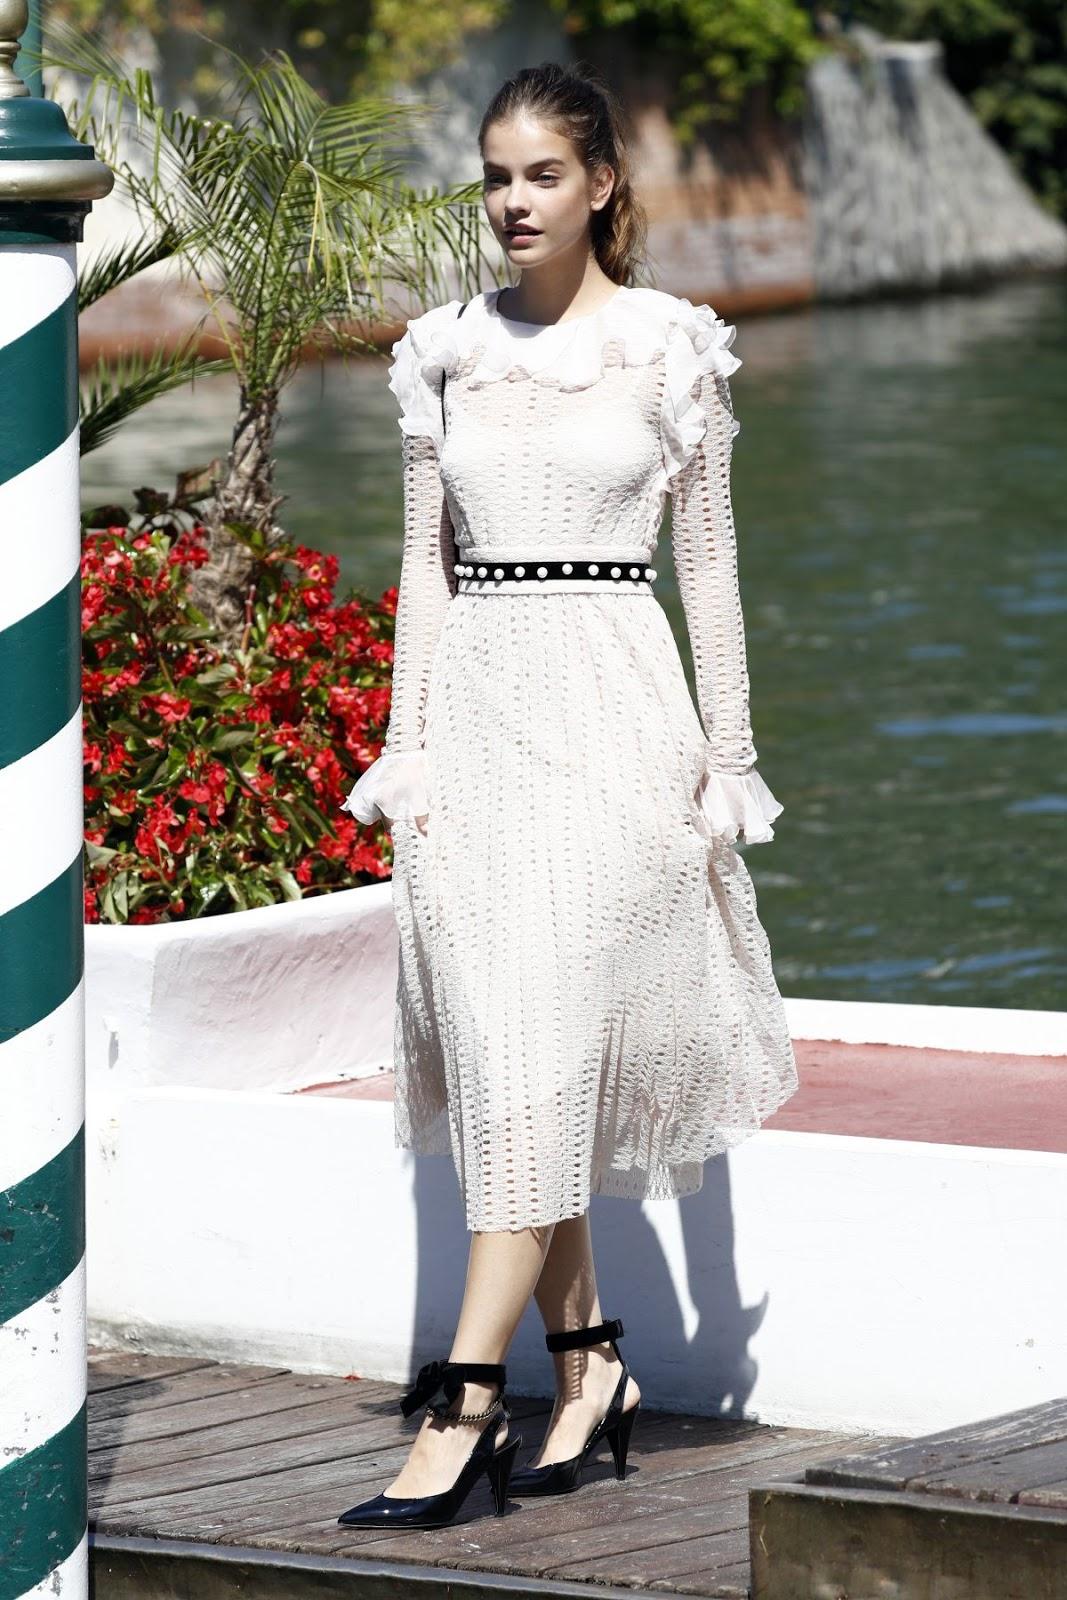 Full HQ Photos of Barbara Palvin Arrives At Hotel Excelsior Venice Film Festival 2016 In Venice